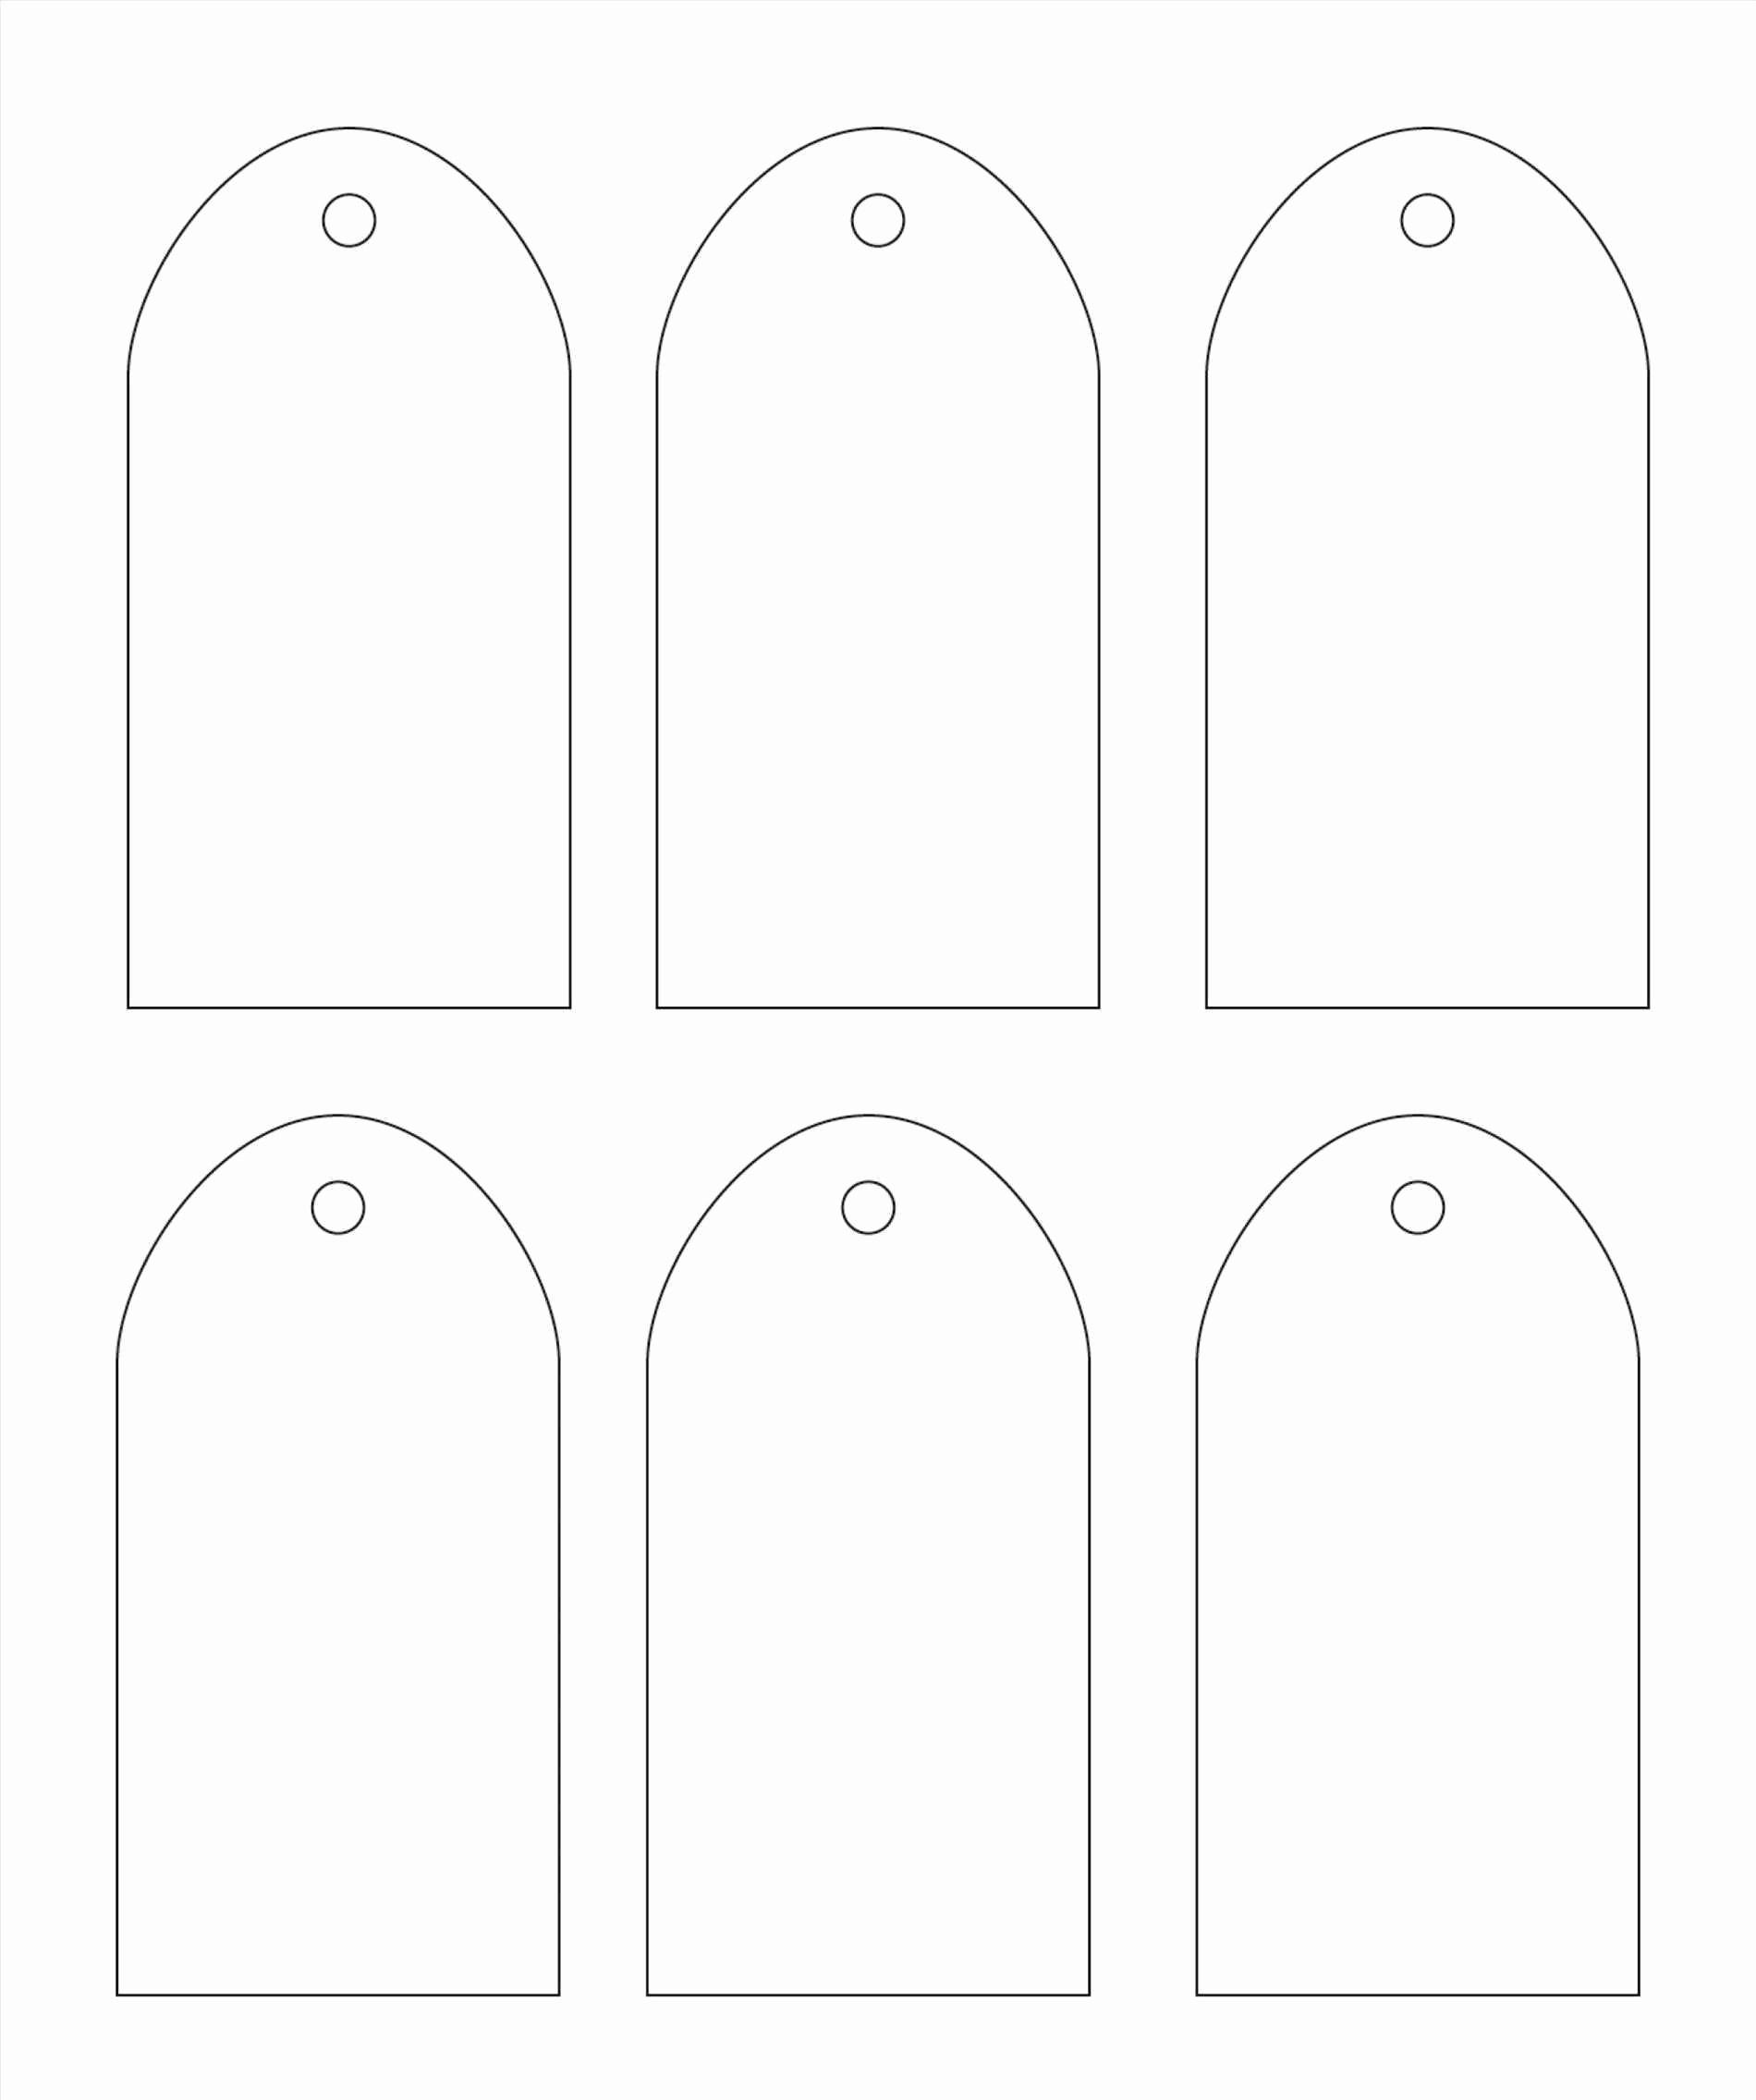 Free Printable Gift Tags Template | Pictimilitude - Free Printable Gift Tag Templates For Word